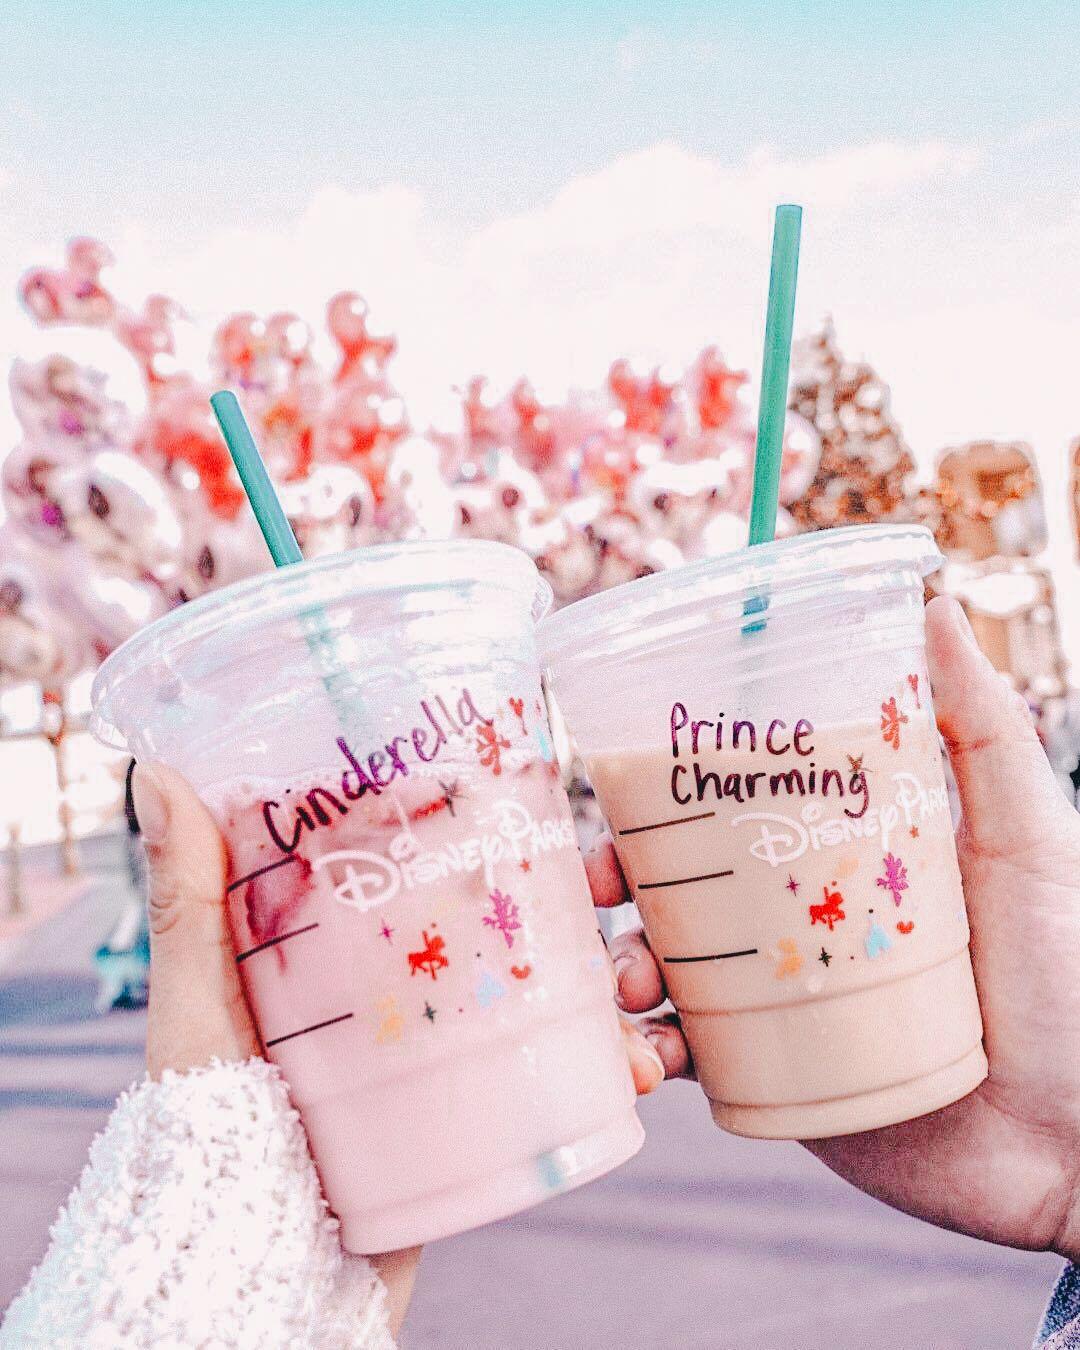 10 Disneyland Travel Blogger Presets for Mobile Adobe Lightroom Instagram Lifestyle Preset Sweet Pink Summer Sweet Pink Powder Photo Editing